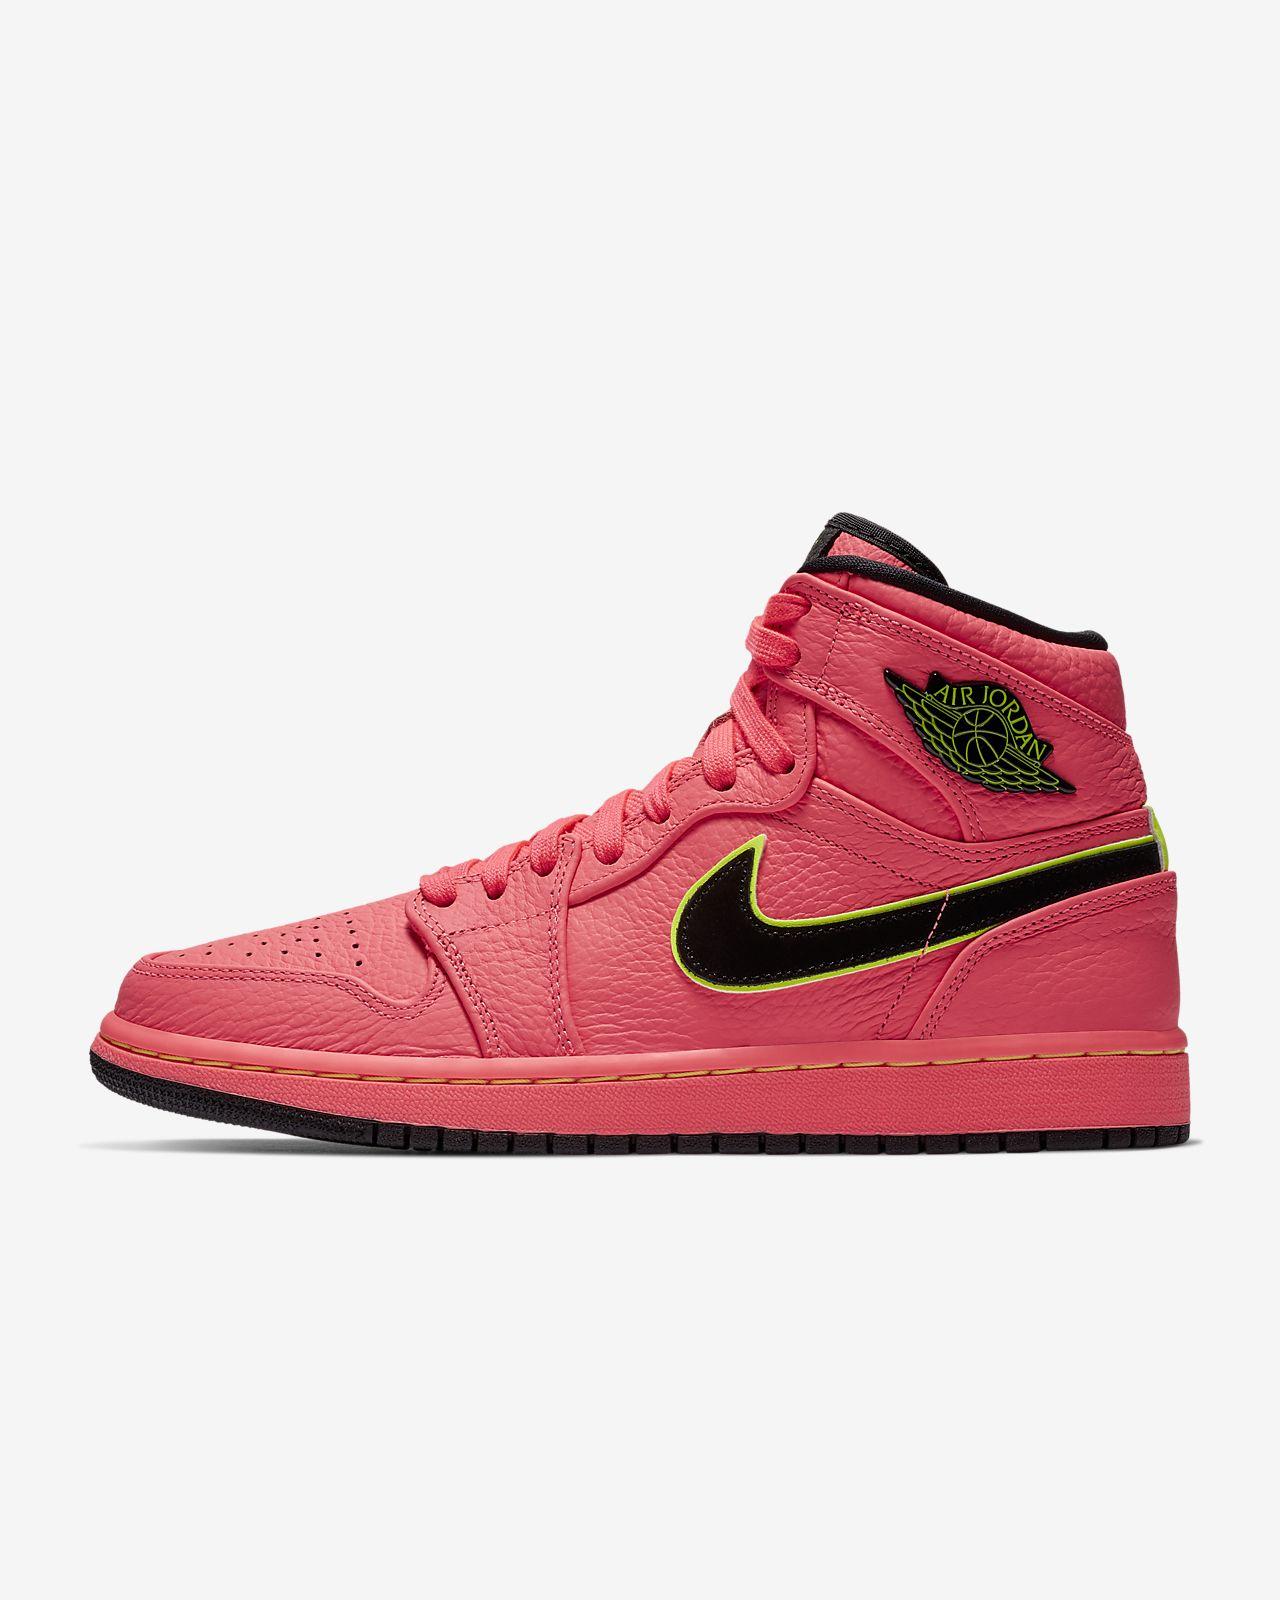 Air Jordan 1 Retro Premium Women's Shoe